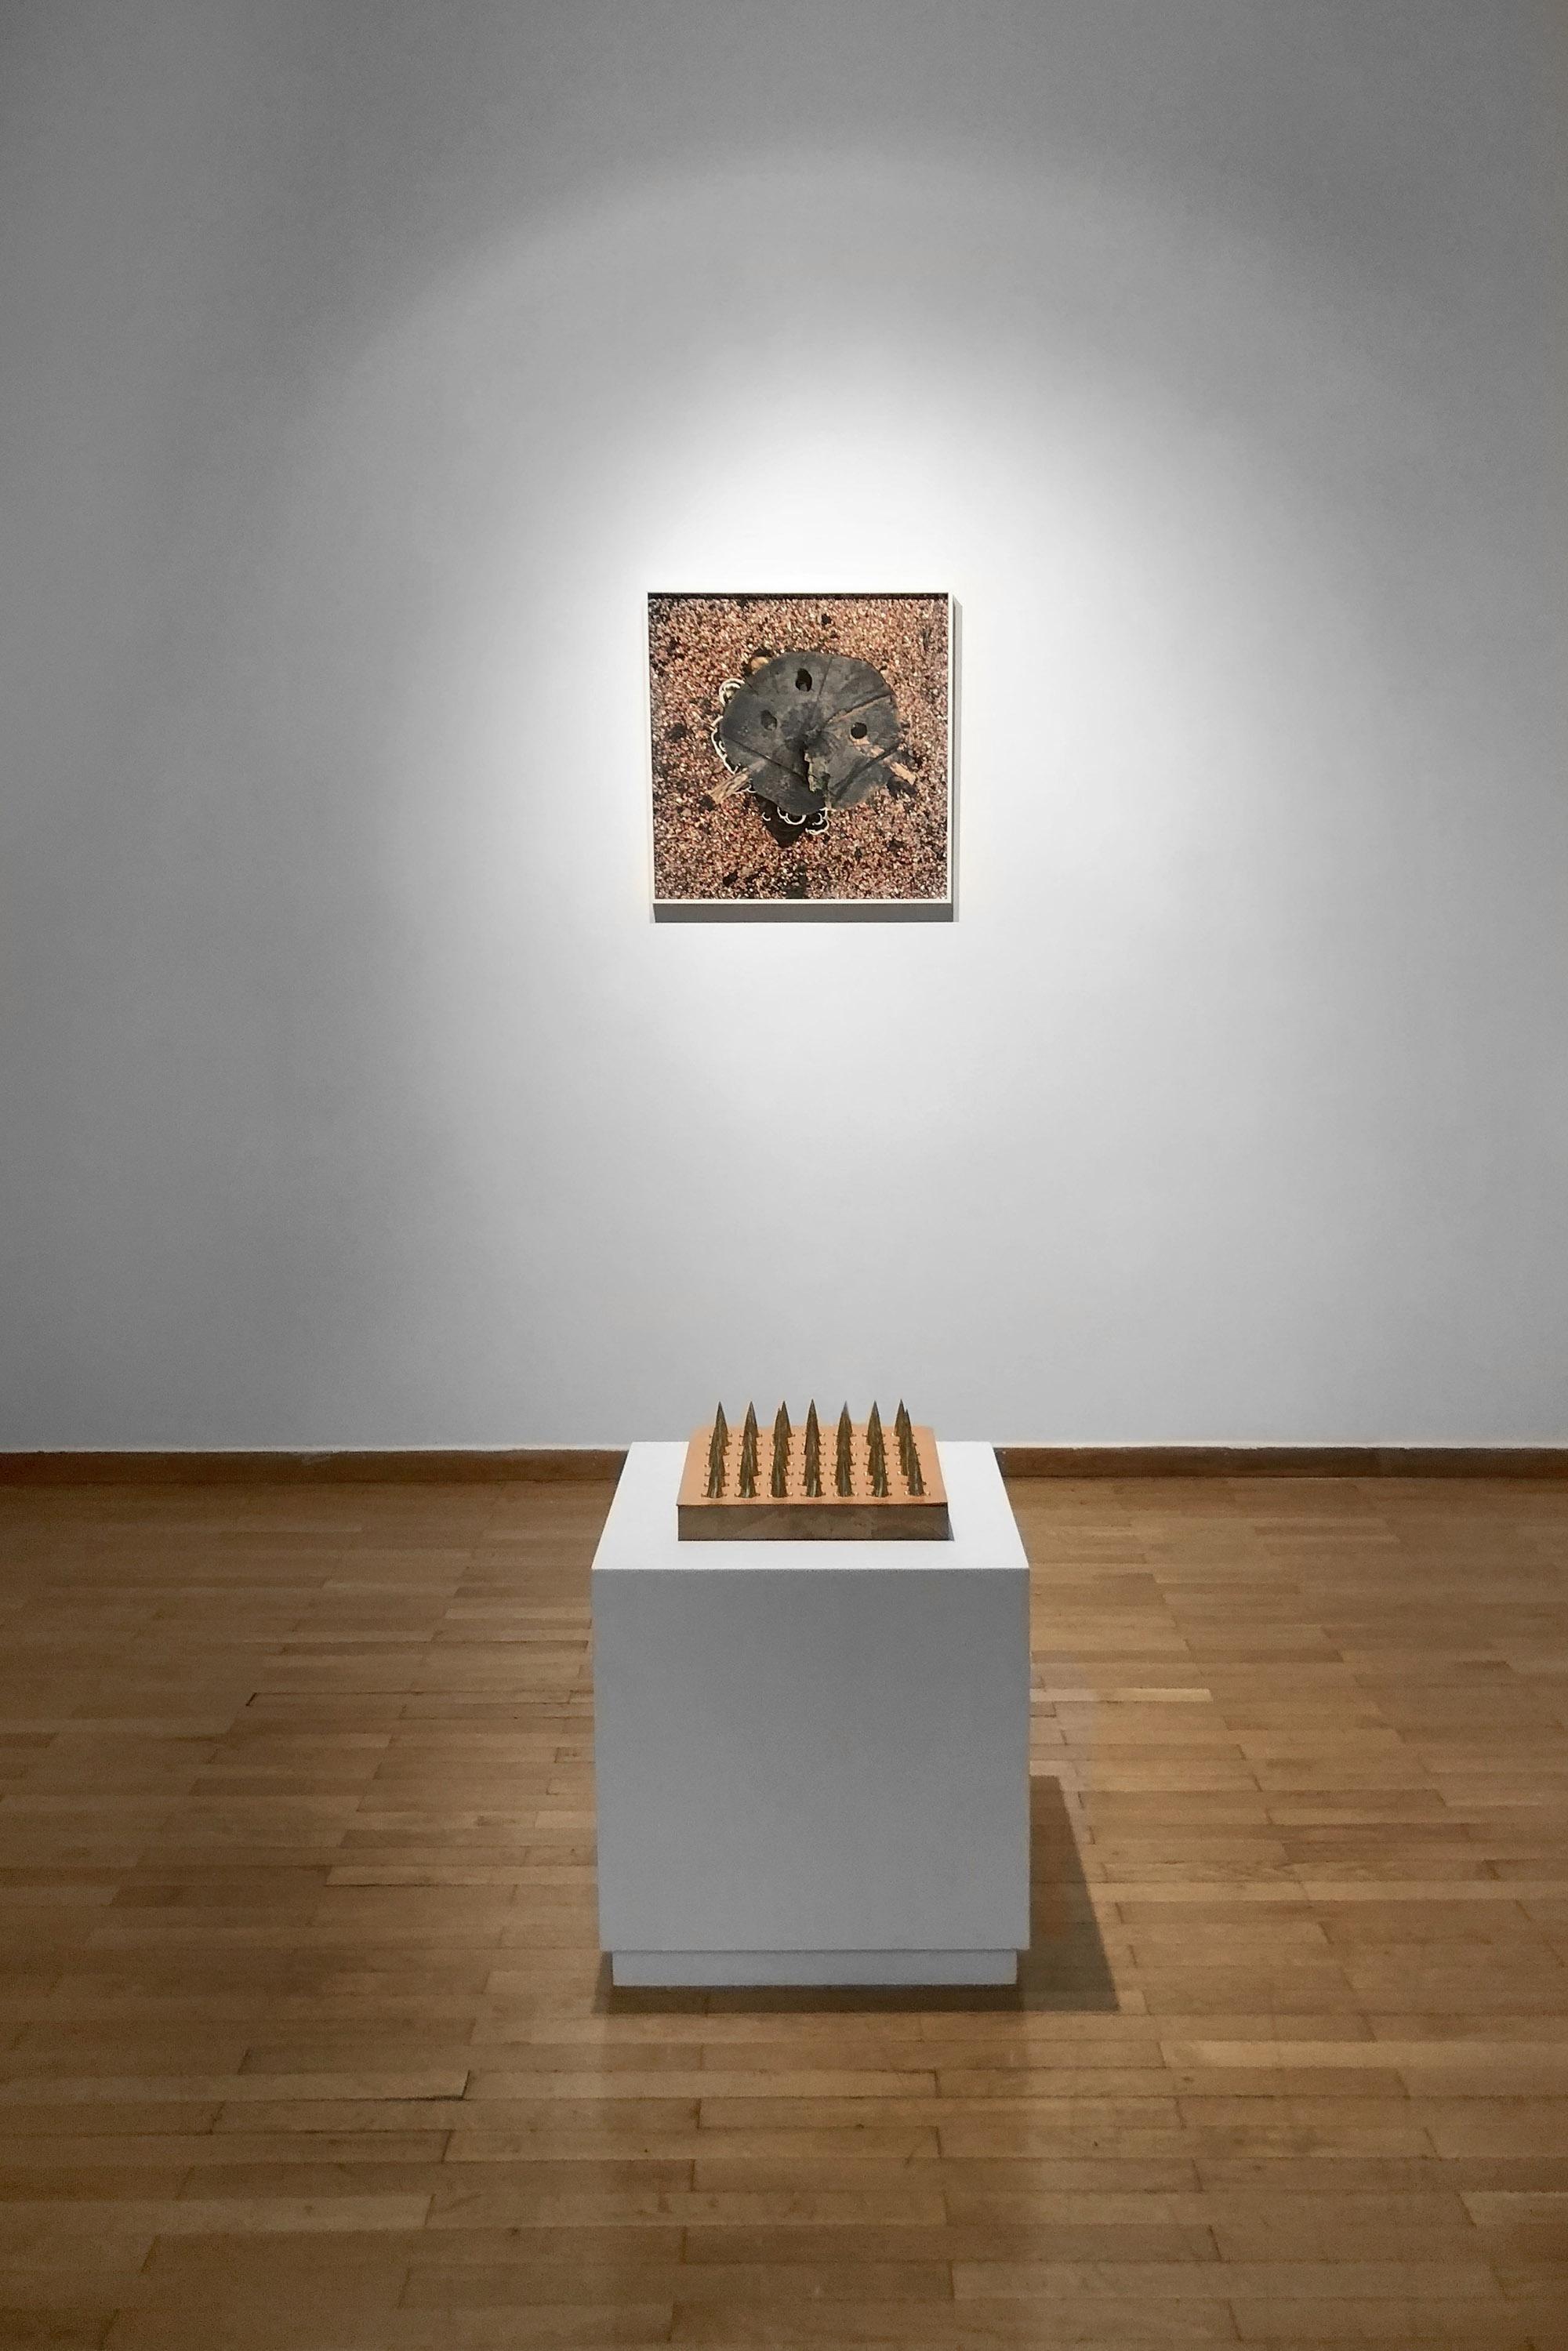 Margarita Myrogianni / Room of Punishment - Image 2